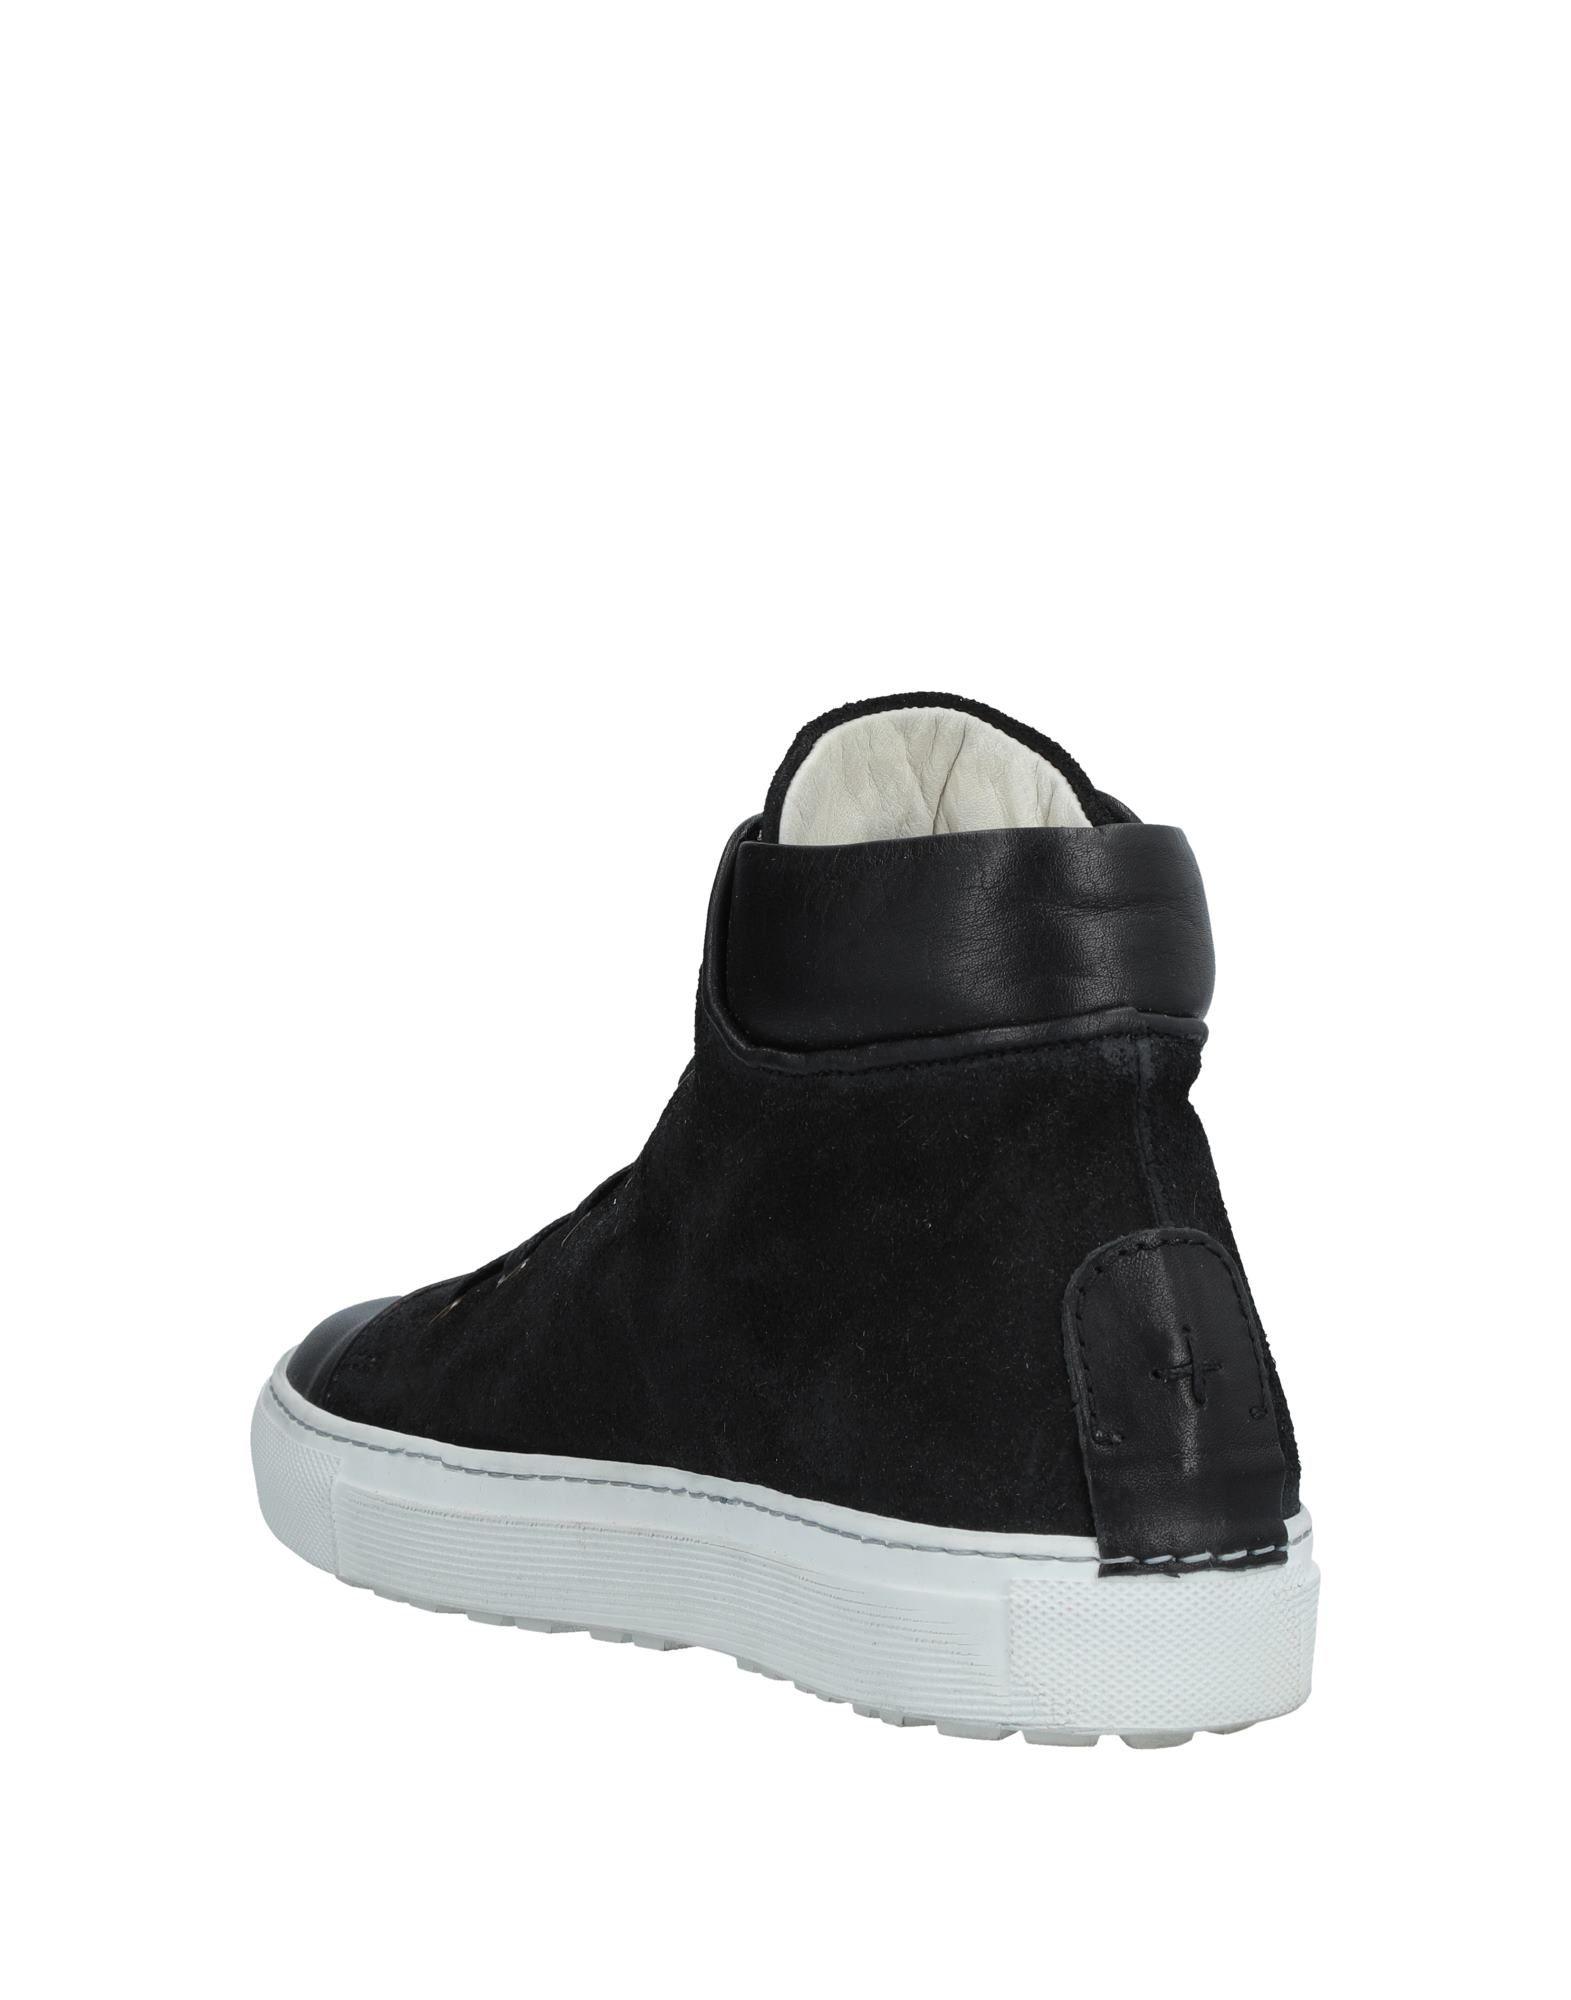 Fiorentini+Baker Sneakers Herren  11537015HF Gute Qualität beliebte Schuhe